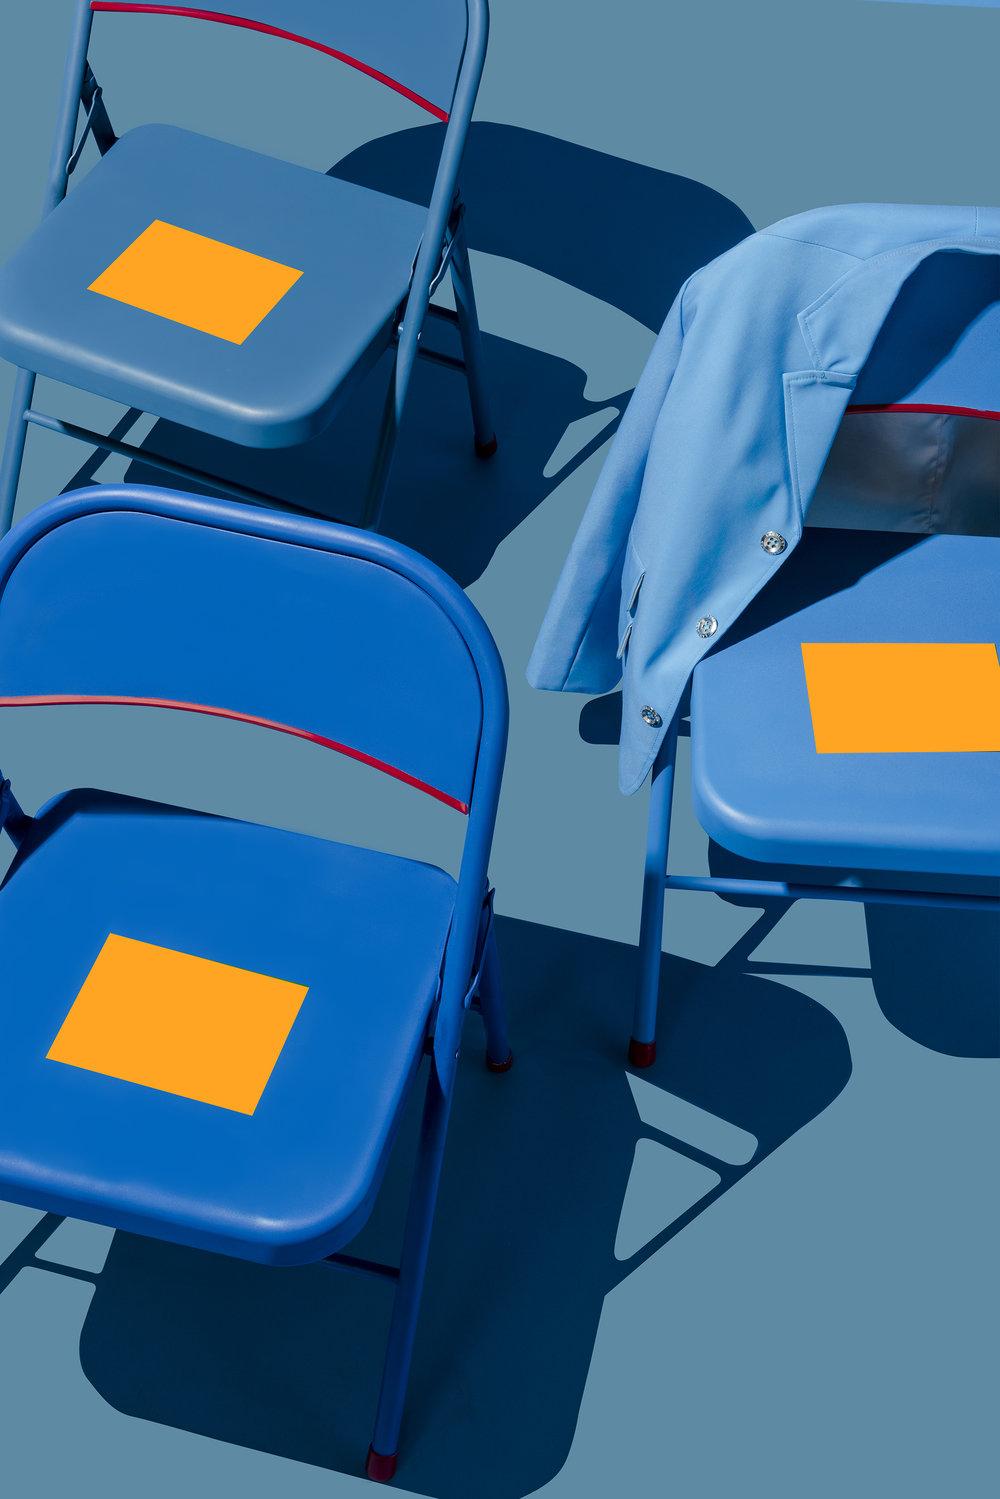 Chairs-2 (1)web.jpg